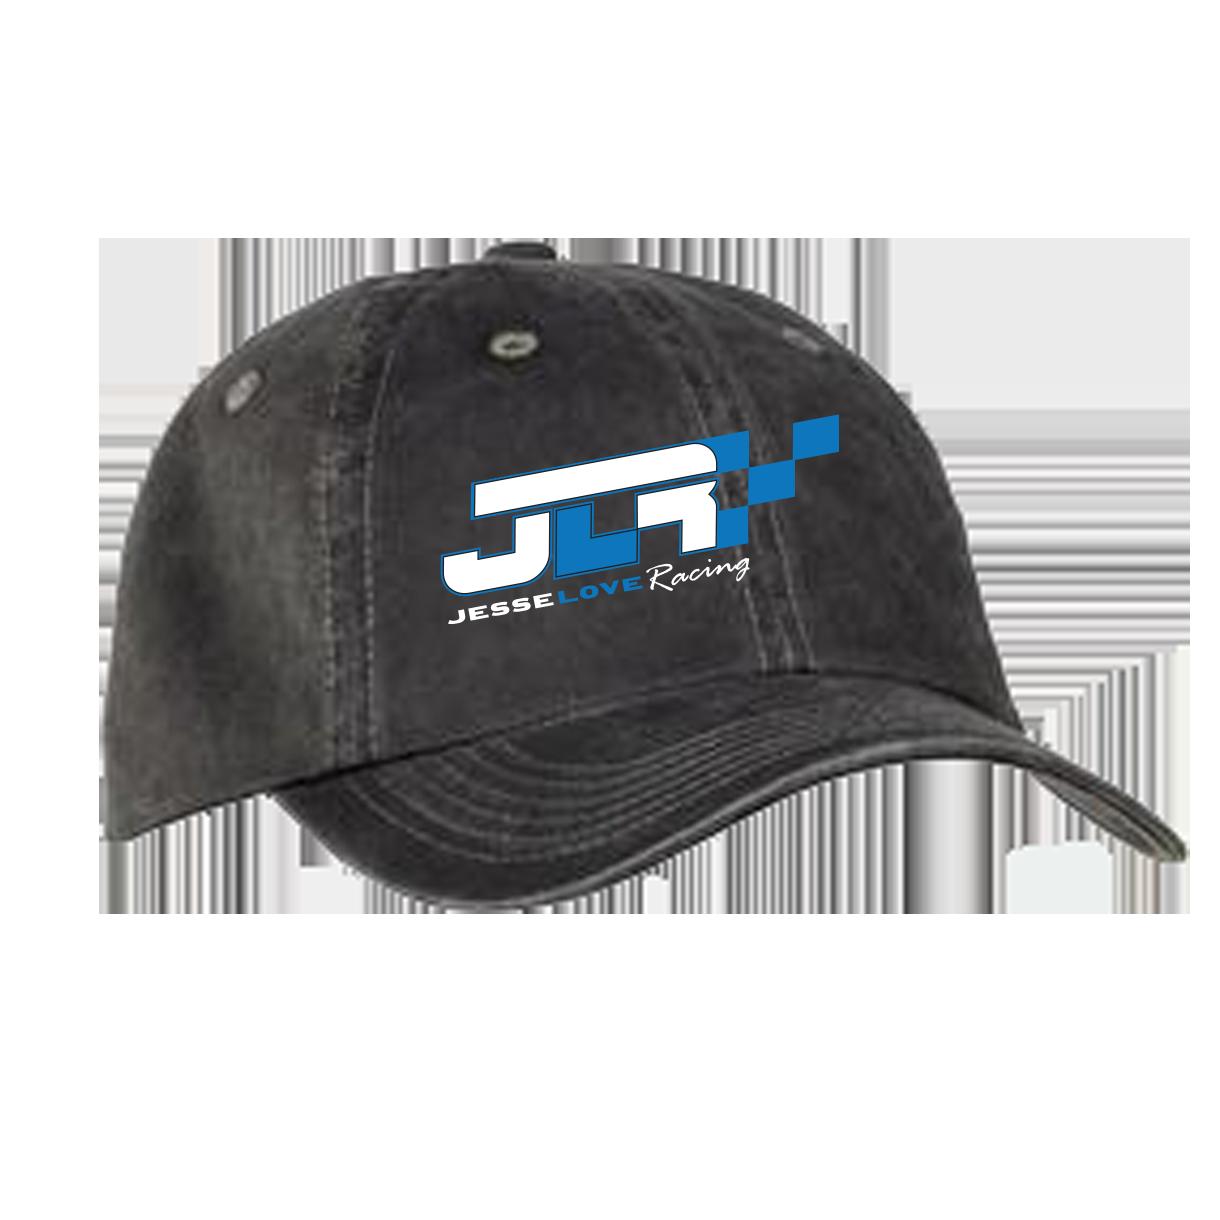 Jesse Love Adjustable Hat